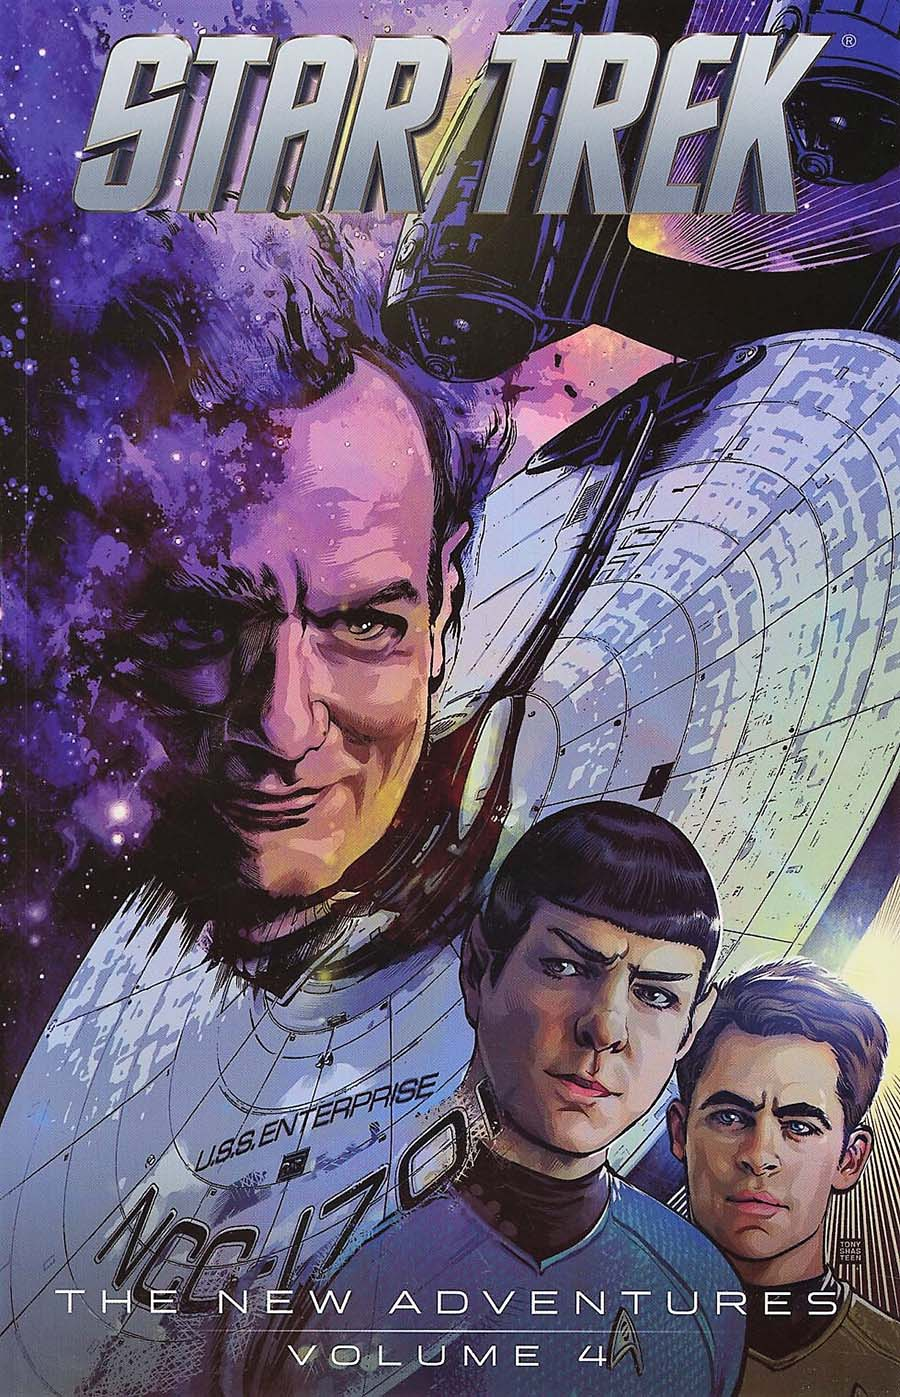 Star Trek New Adventures Vol 4 TP